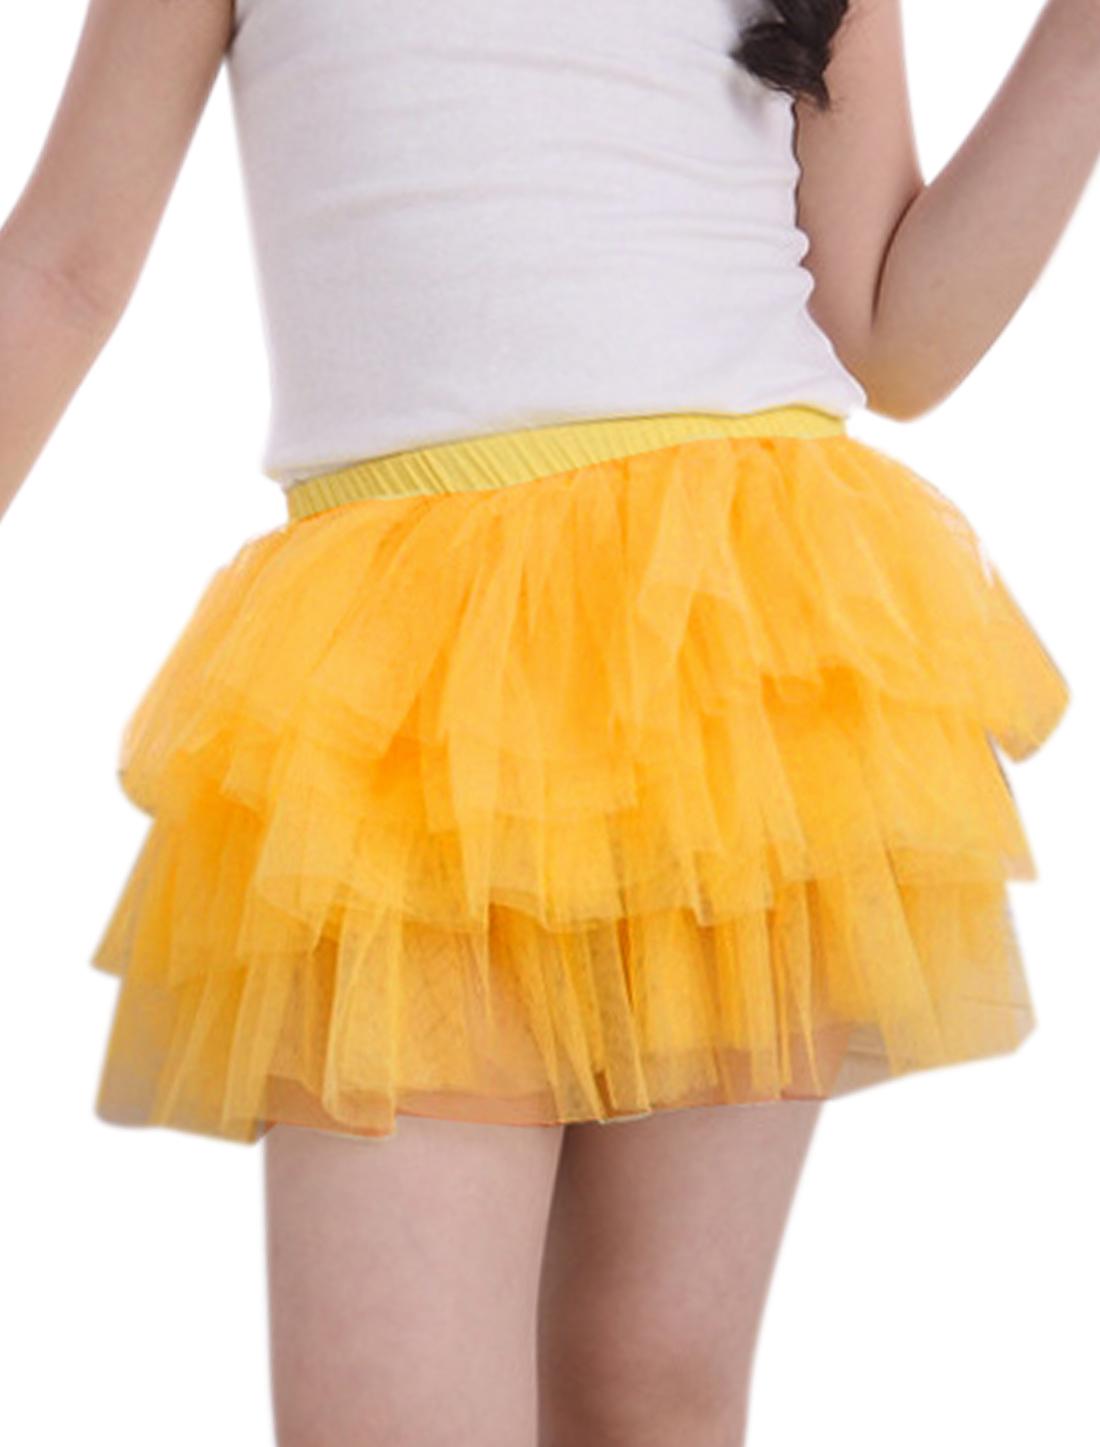 Girls Elastic Waist Mesh Panel Tiered A Line Skirt Yellow 3T